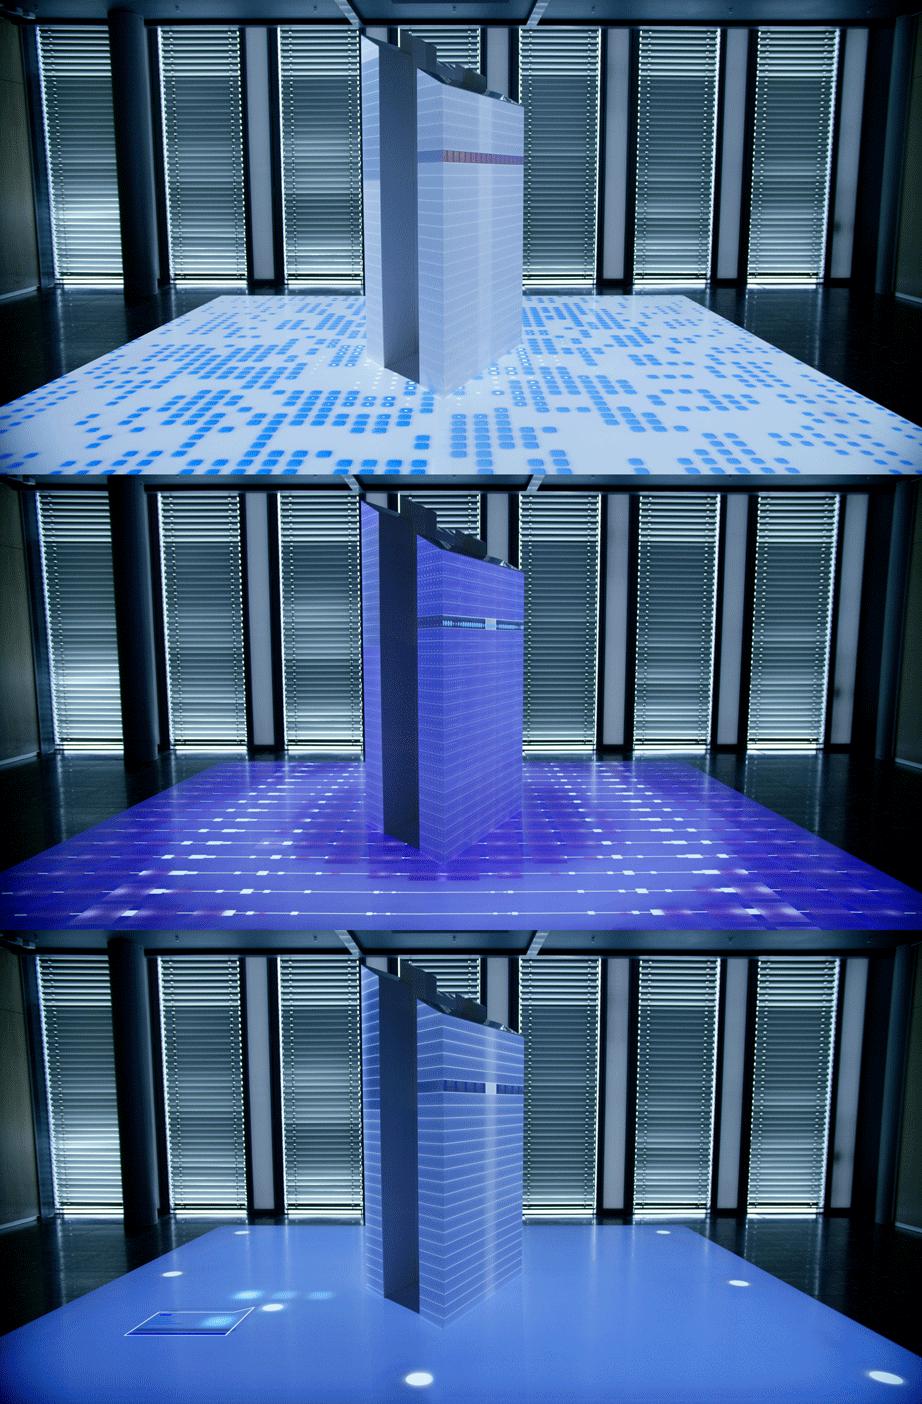 IMB Watson IoT Center Monomango Exponat